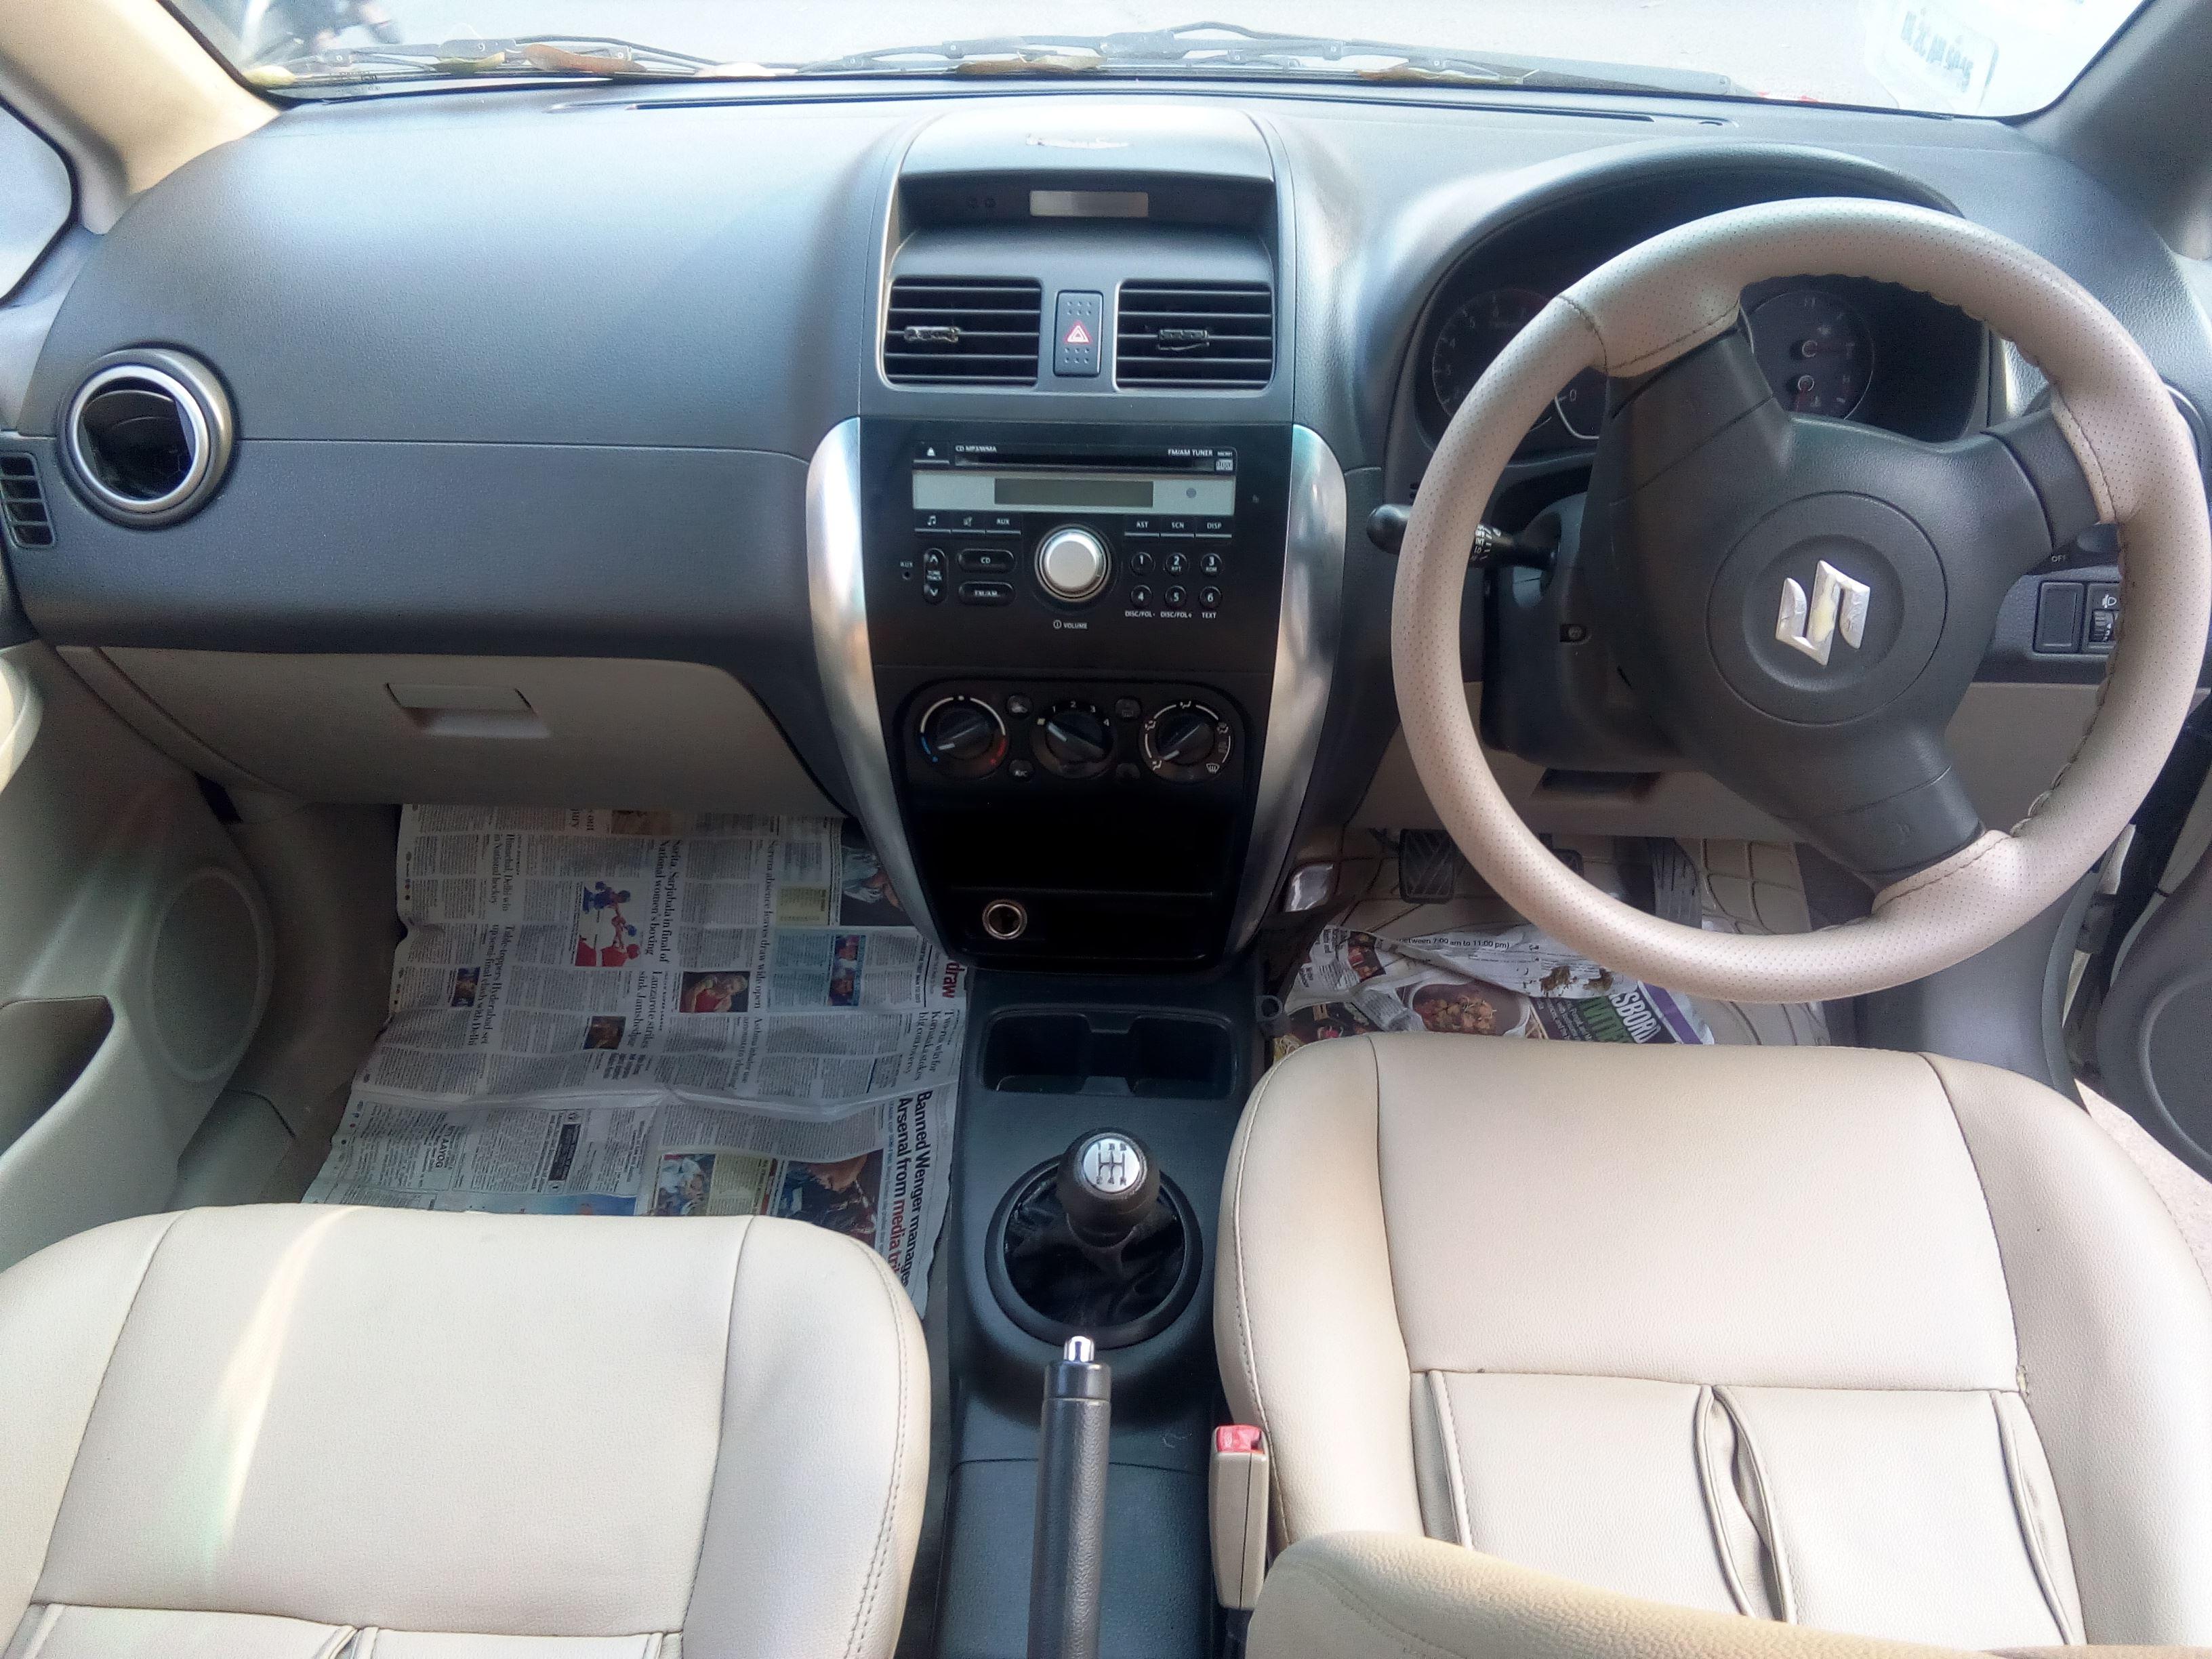 2009 Used Maruti Suzuki Sx4 VXI